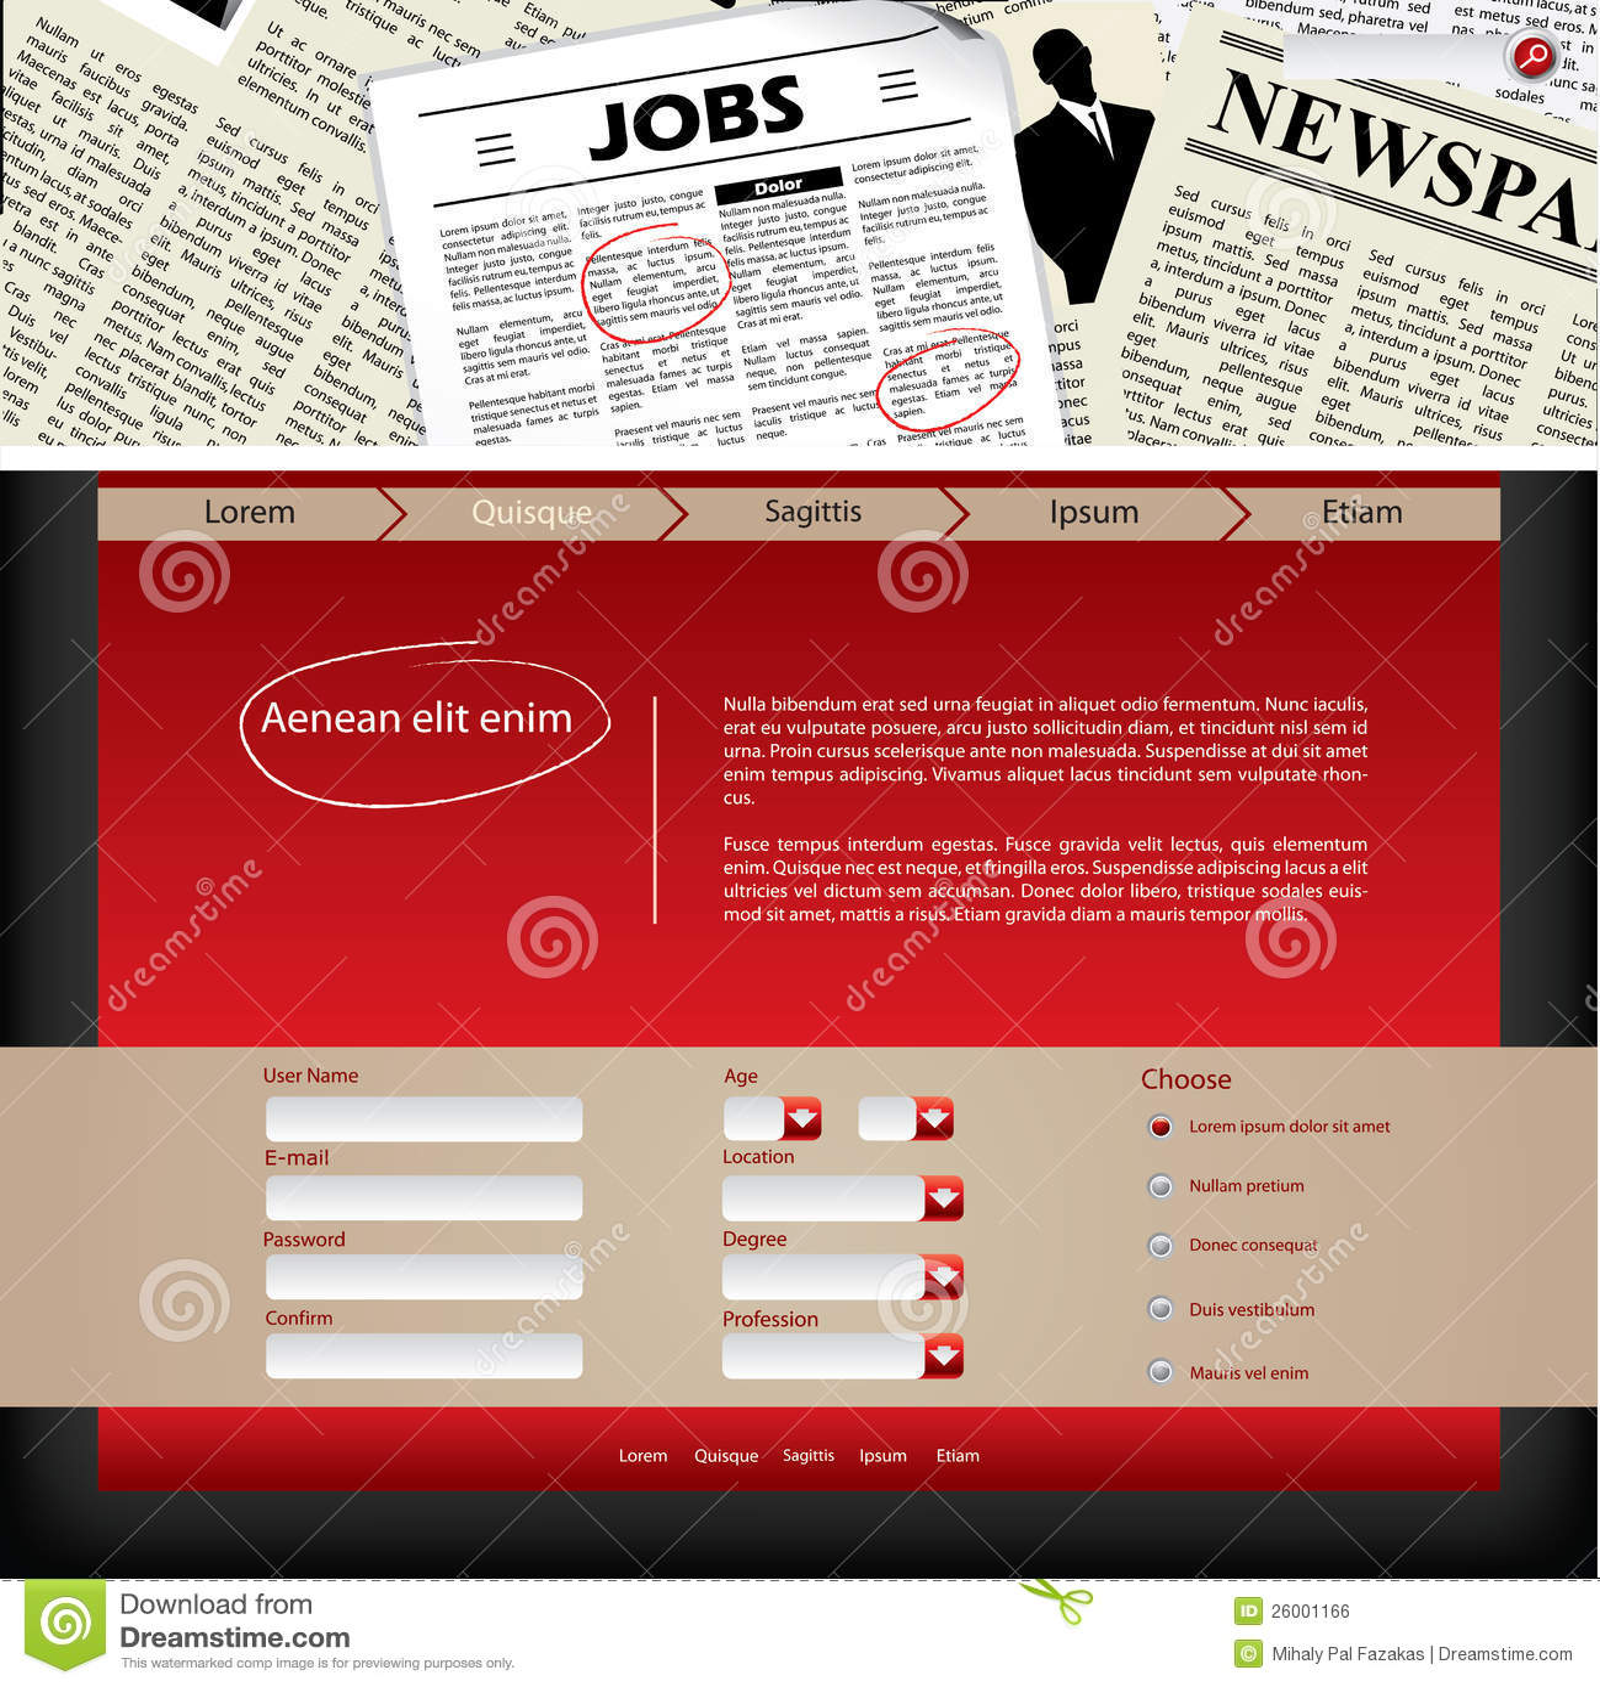 Latest News Header: Website Template Design With Newspaper Header Royalty Free